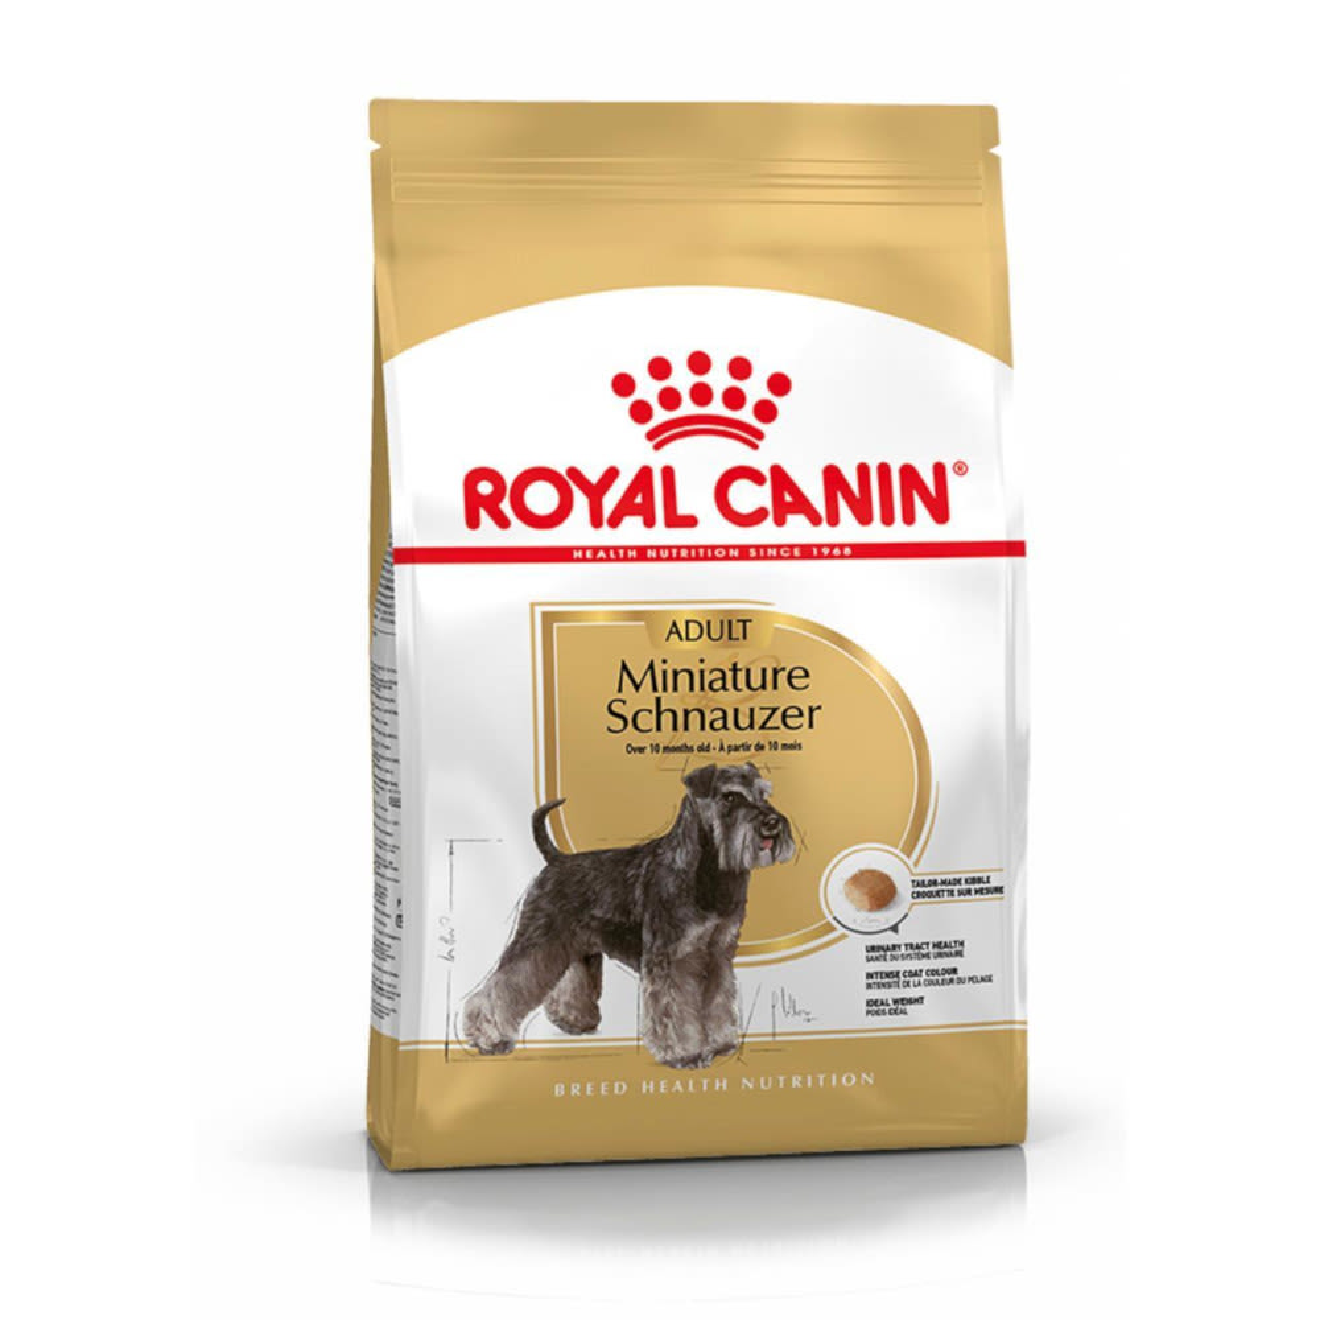 Dog Food Royal Canin Ingredients